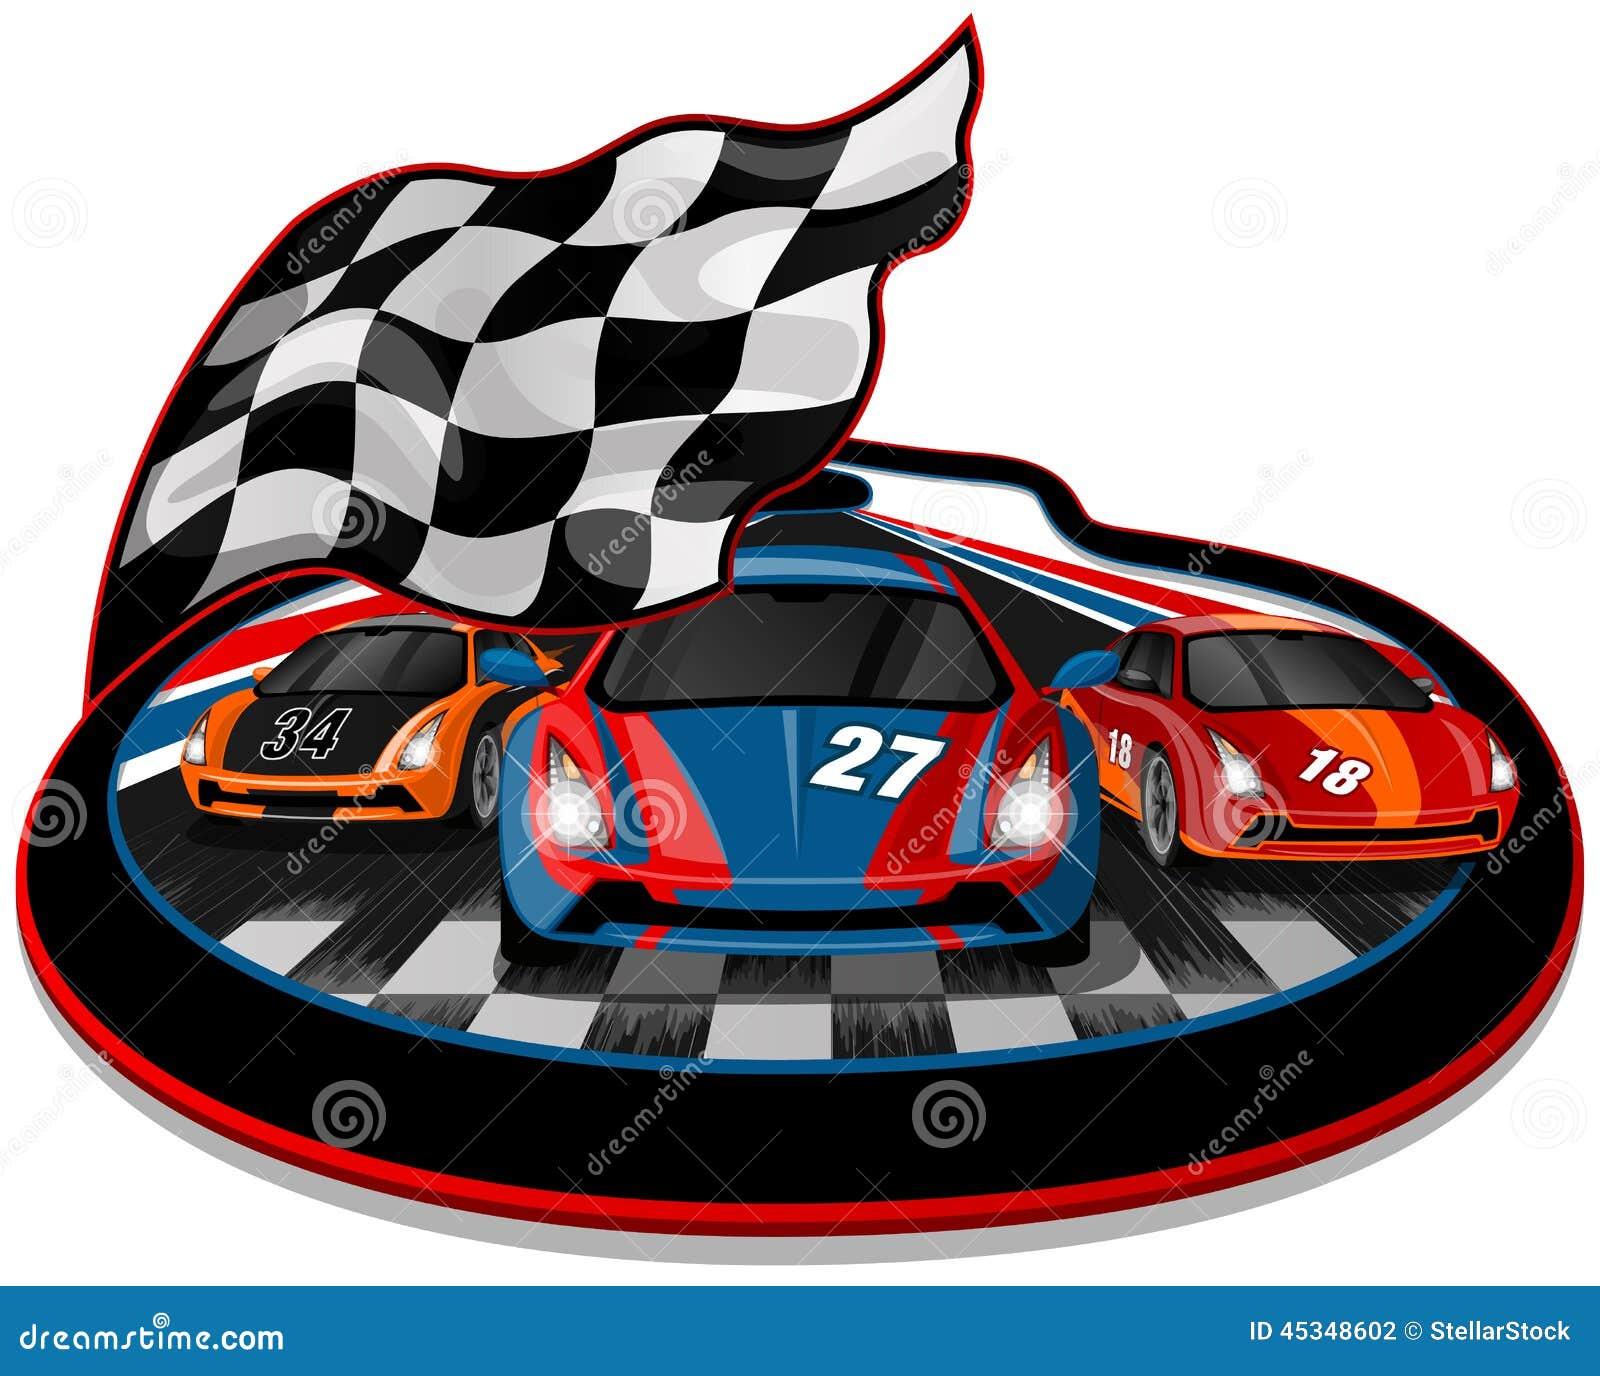 Design car flags - Three Speeding Racing Cars